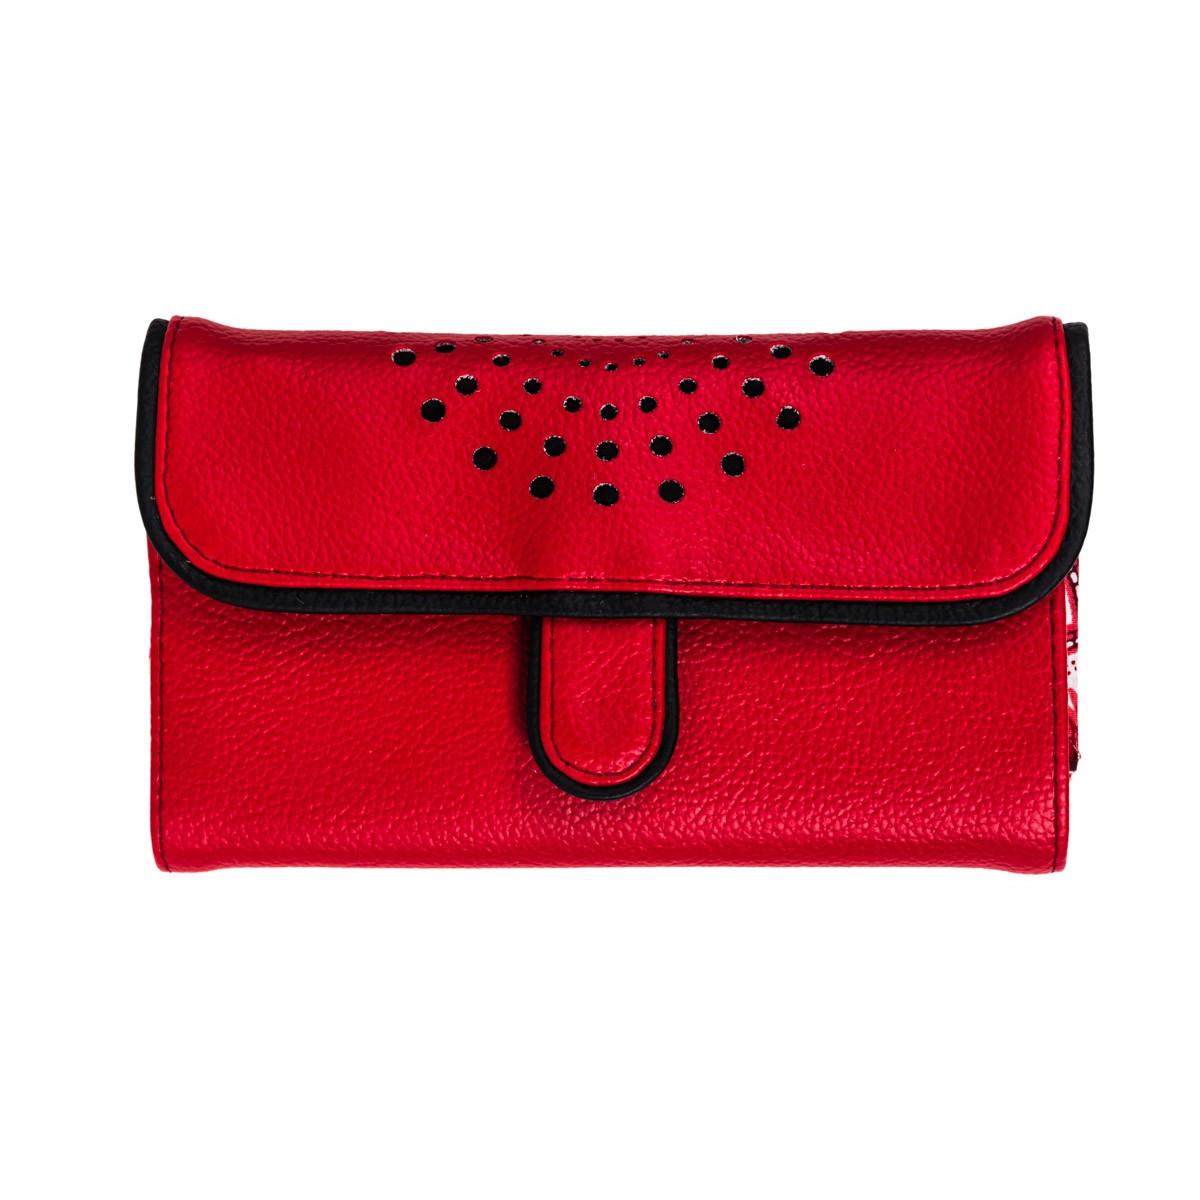 Portefeuille femme original Api rouge